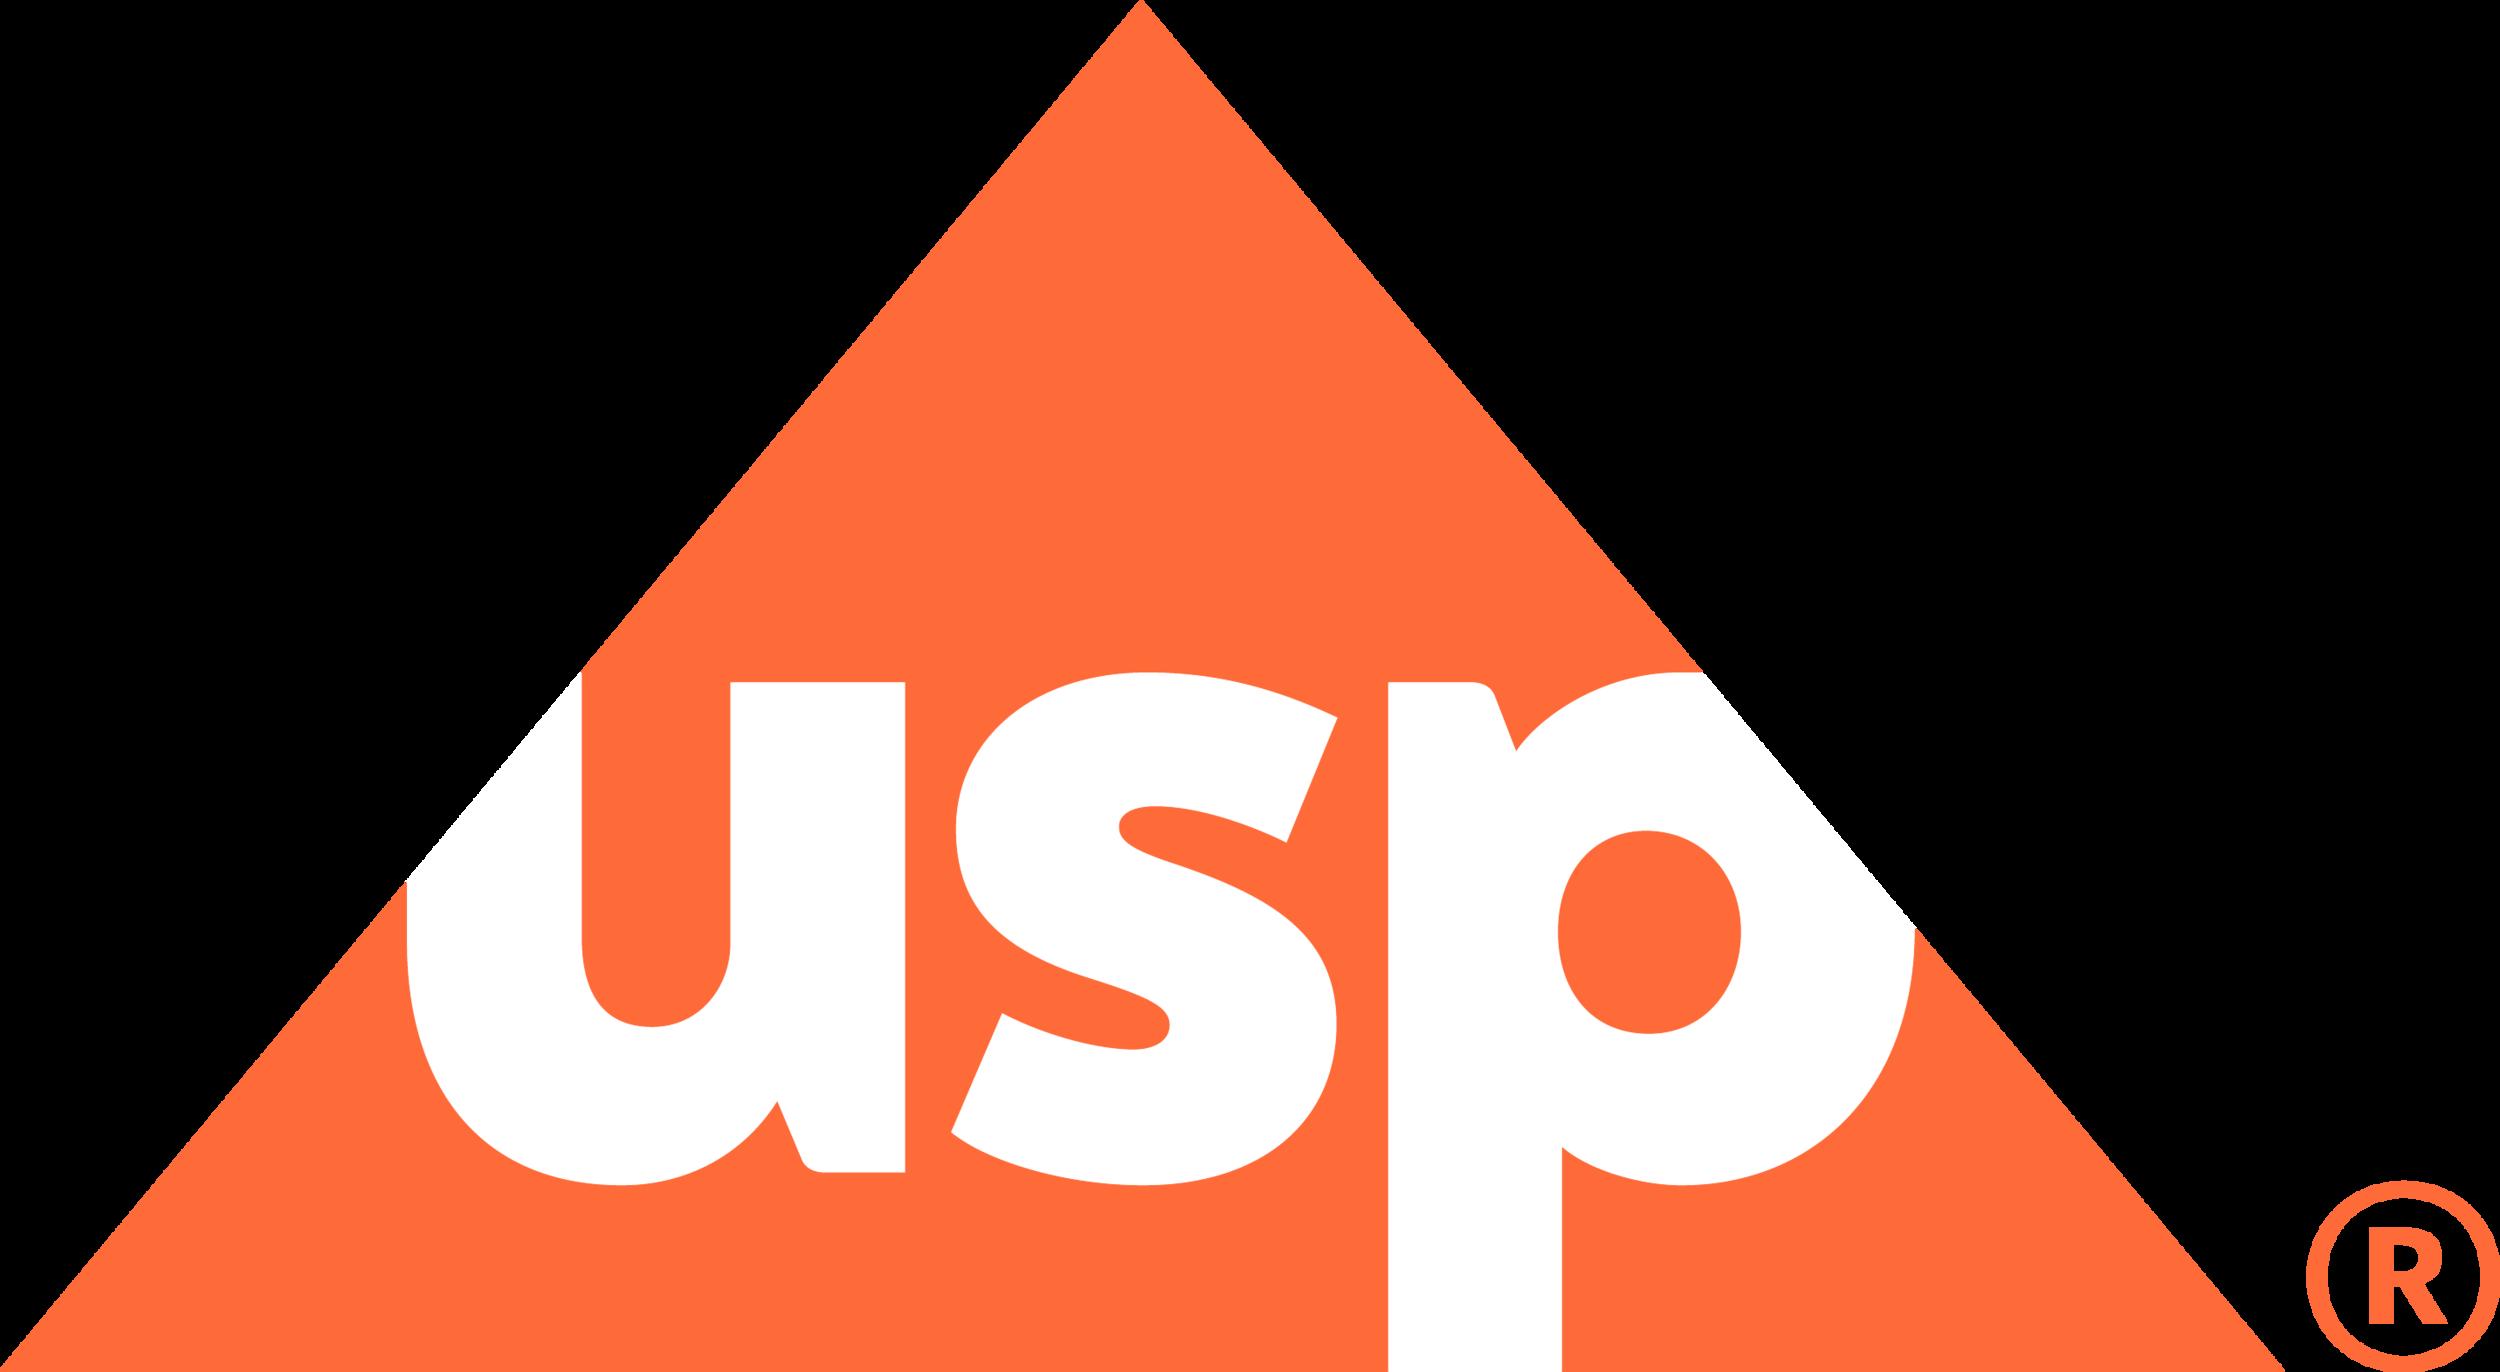 coated_usp_logo_RGB_2018_orange_r.png